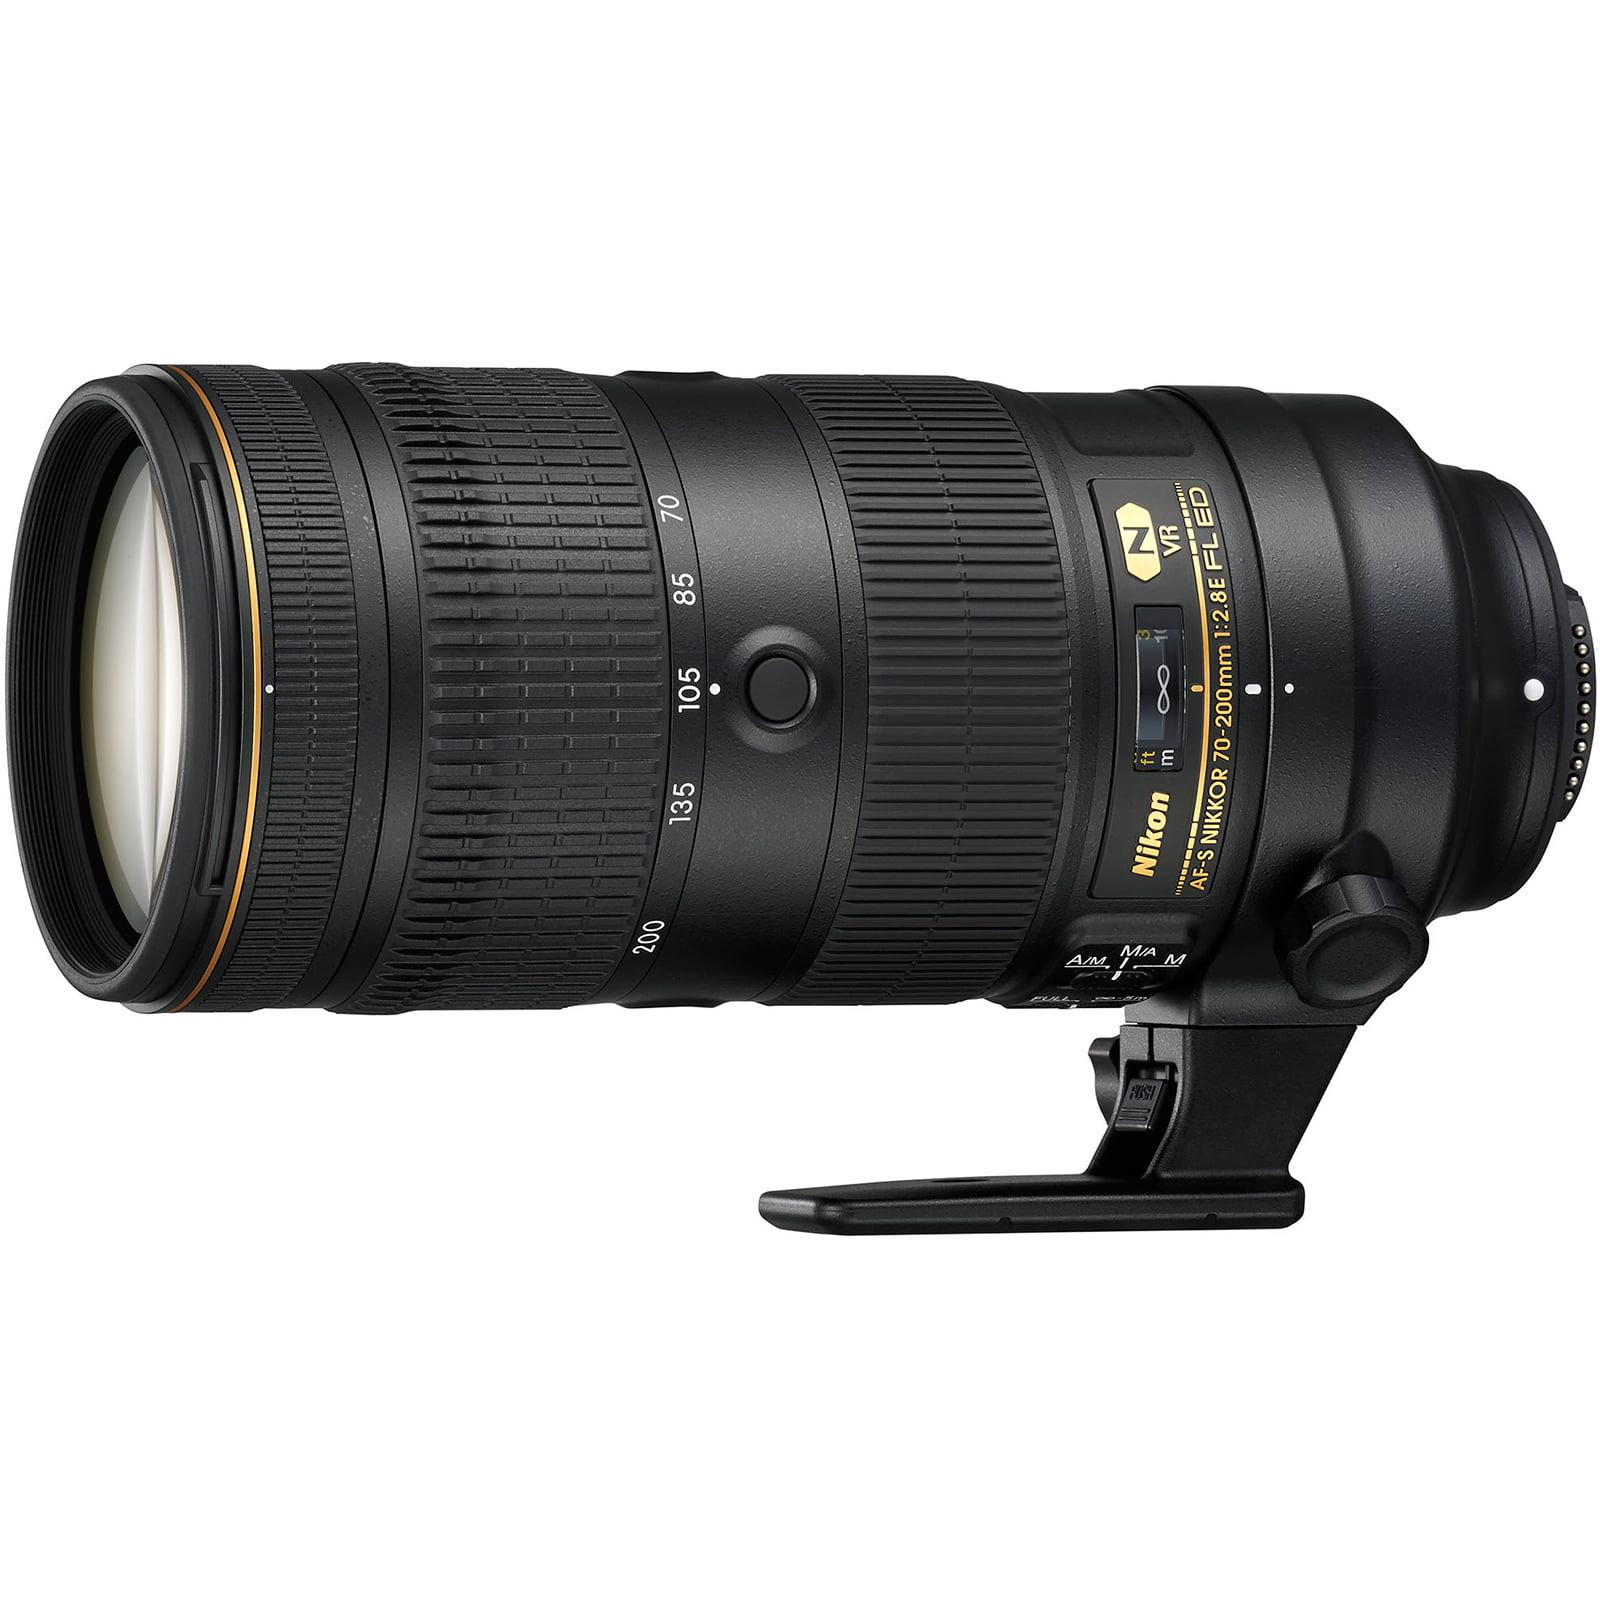 Nikon 70-200mm f 2.8E FL VR AF-S ED Zoom-Nikkor Lens by Nikon